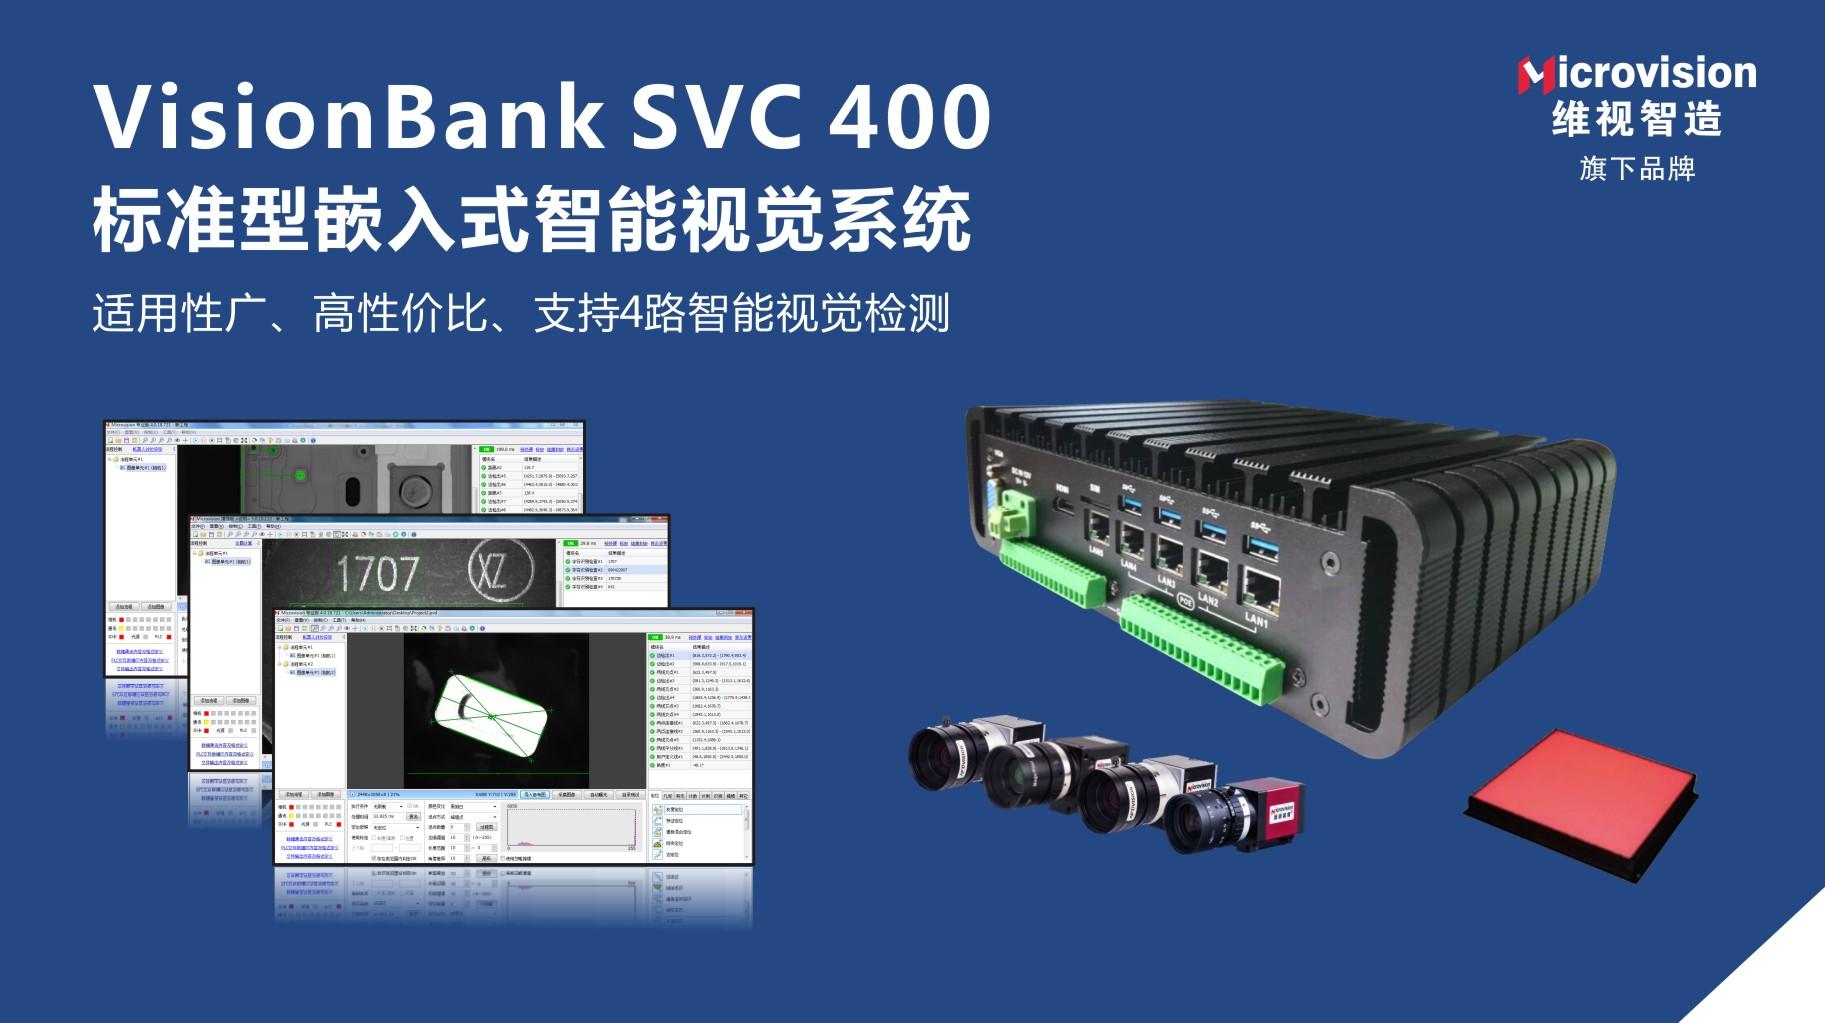 VisionBank SVC400标准型嵌入式智能视觉系统.jpg